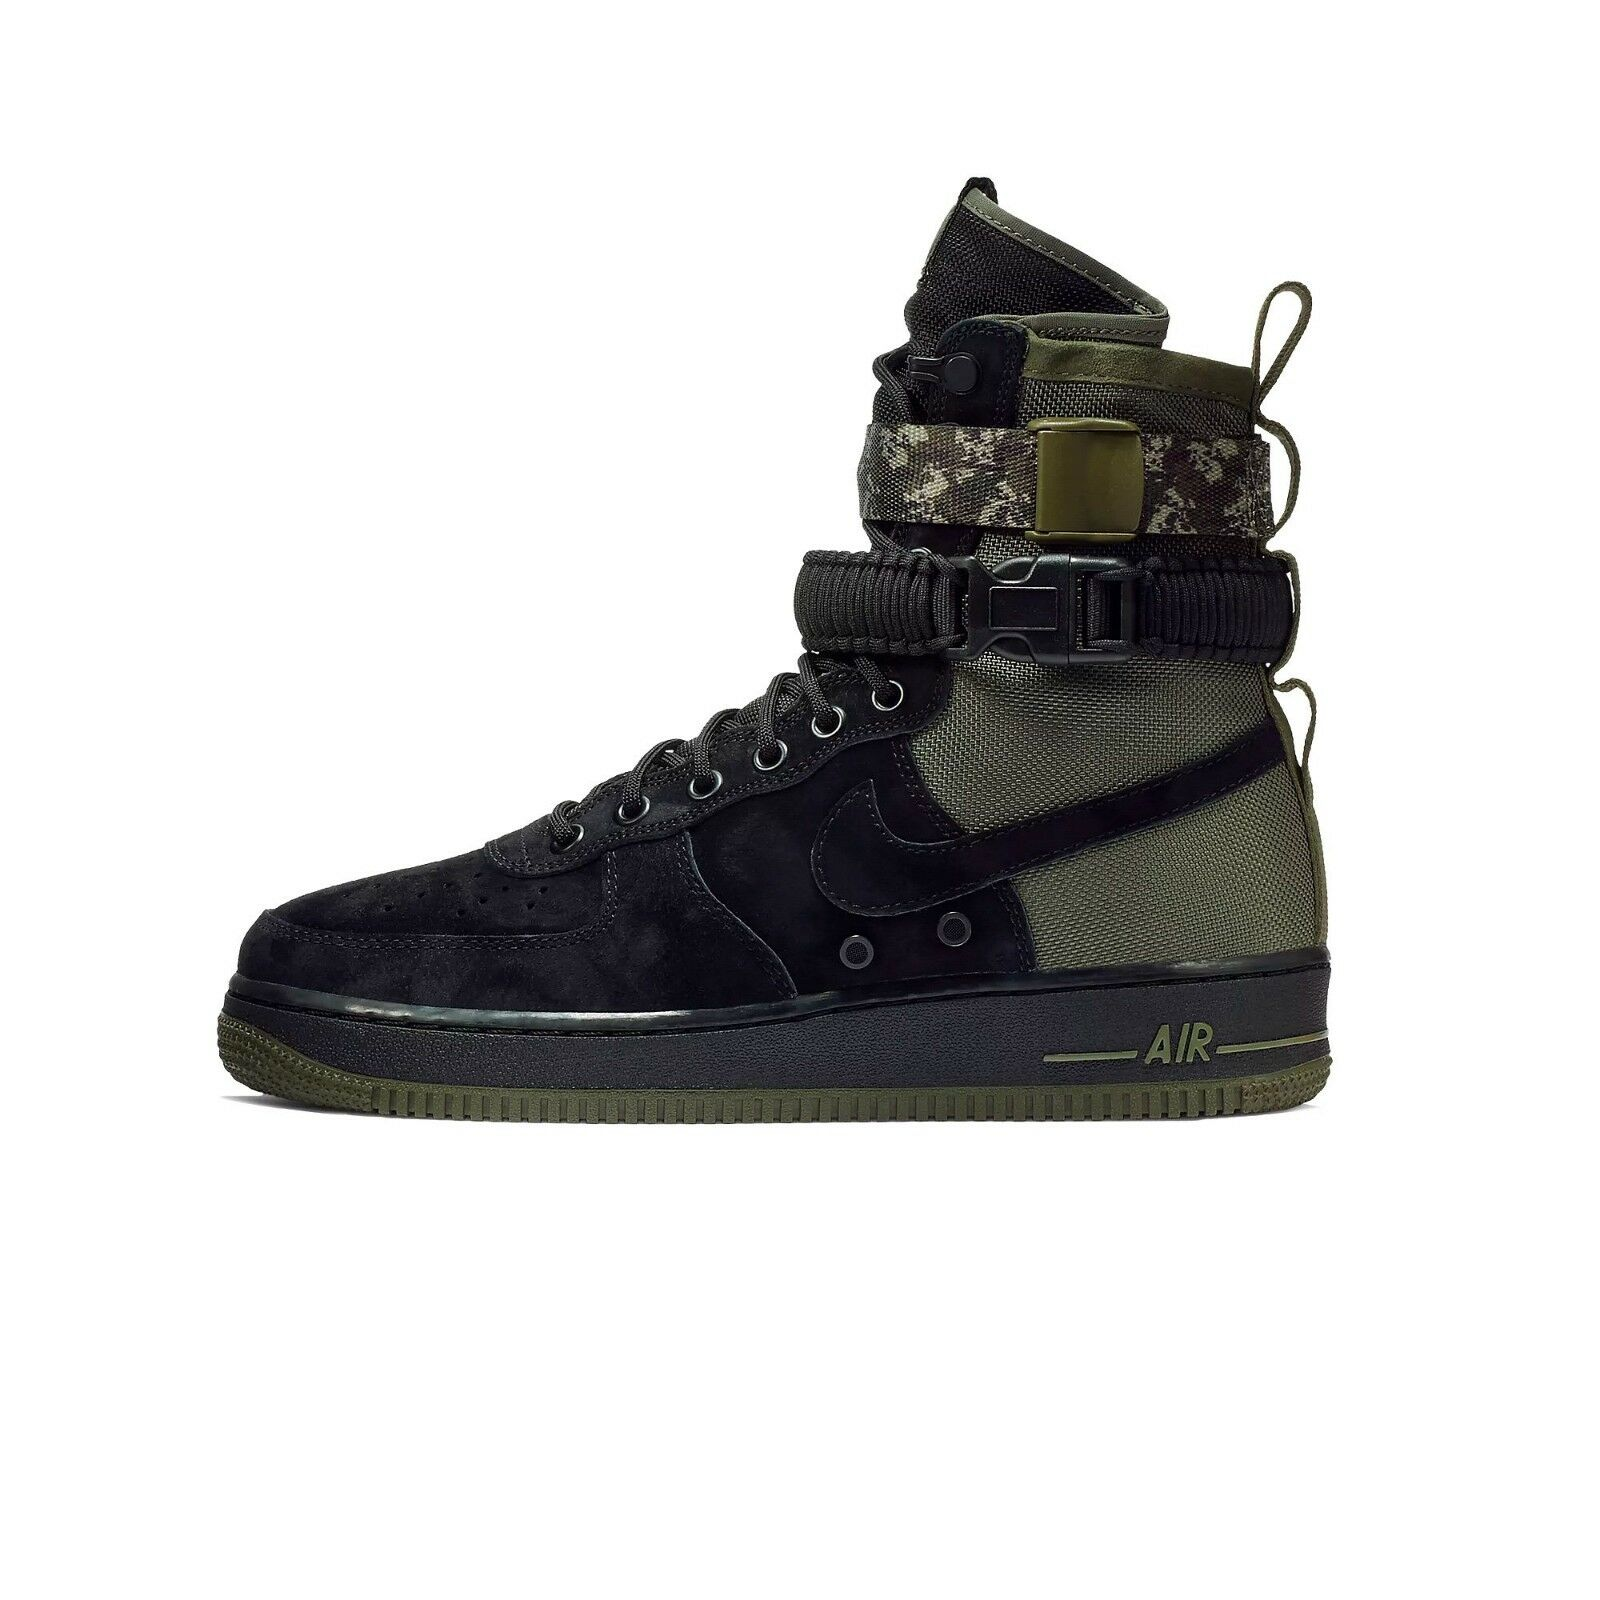 Nike air force force force 1 sf schuh schwarze olive camo sz 7.5 - 13. d6400e